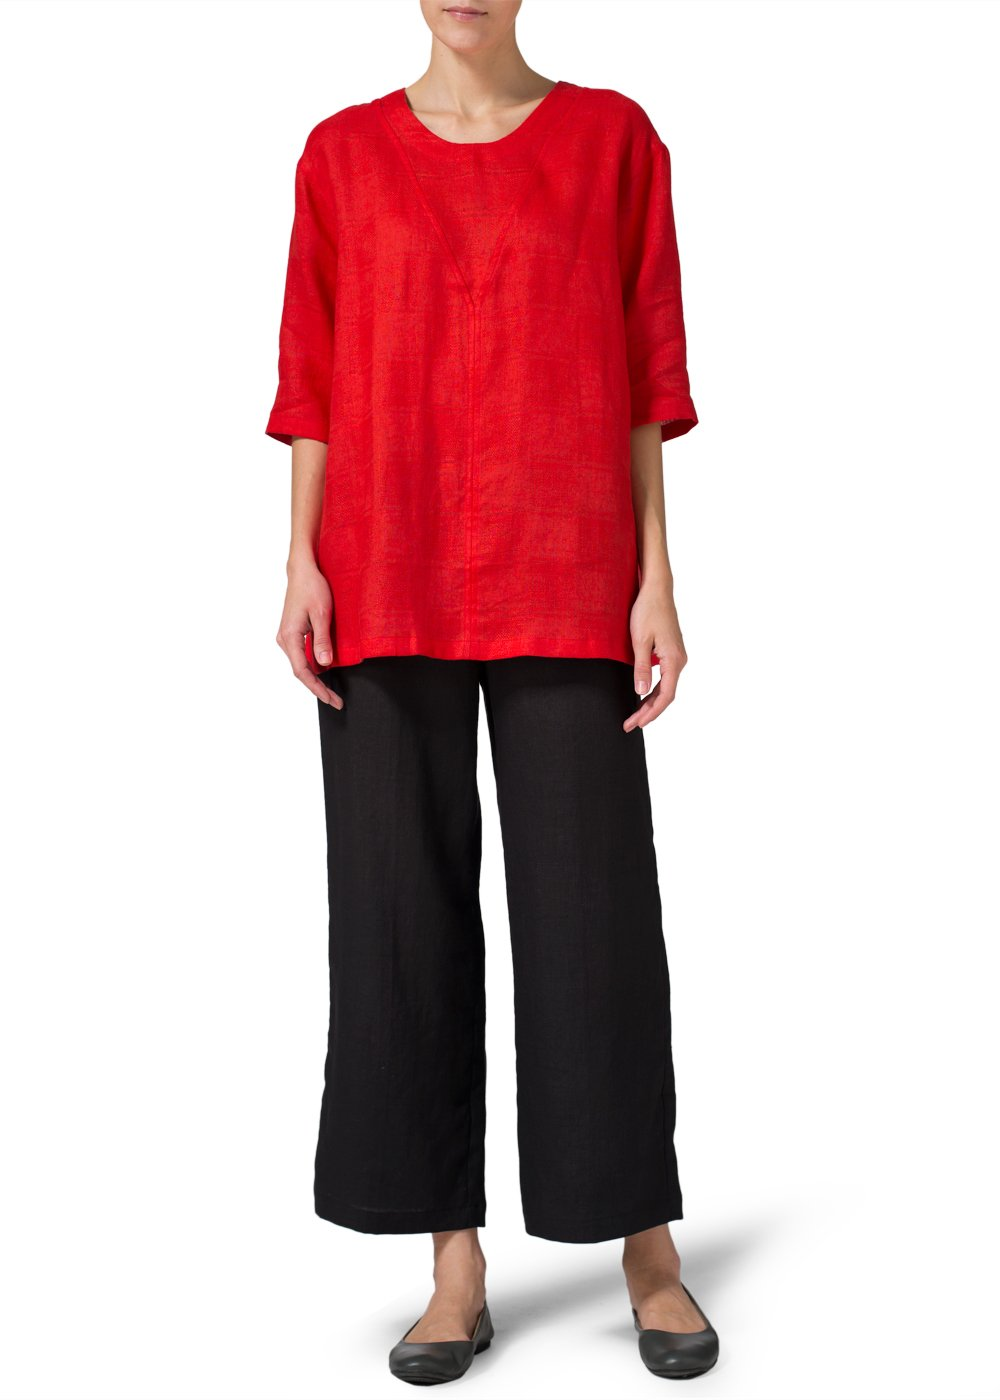 Vivid Linen Scoop-Neck Tunics-2X-Red